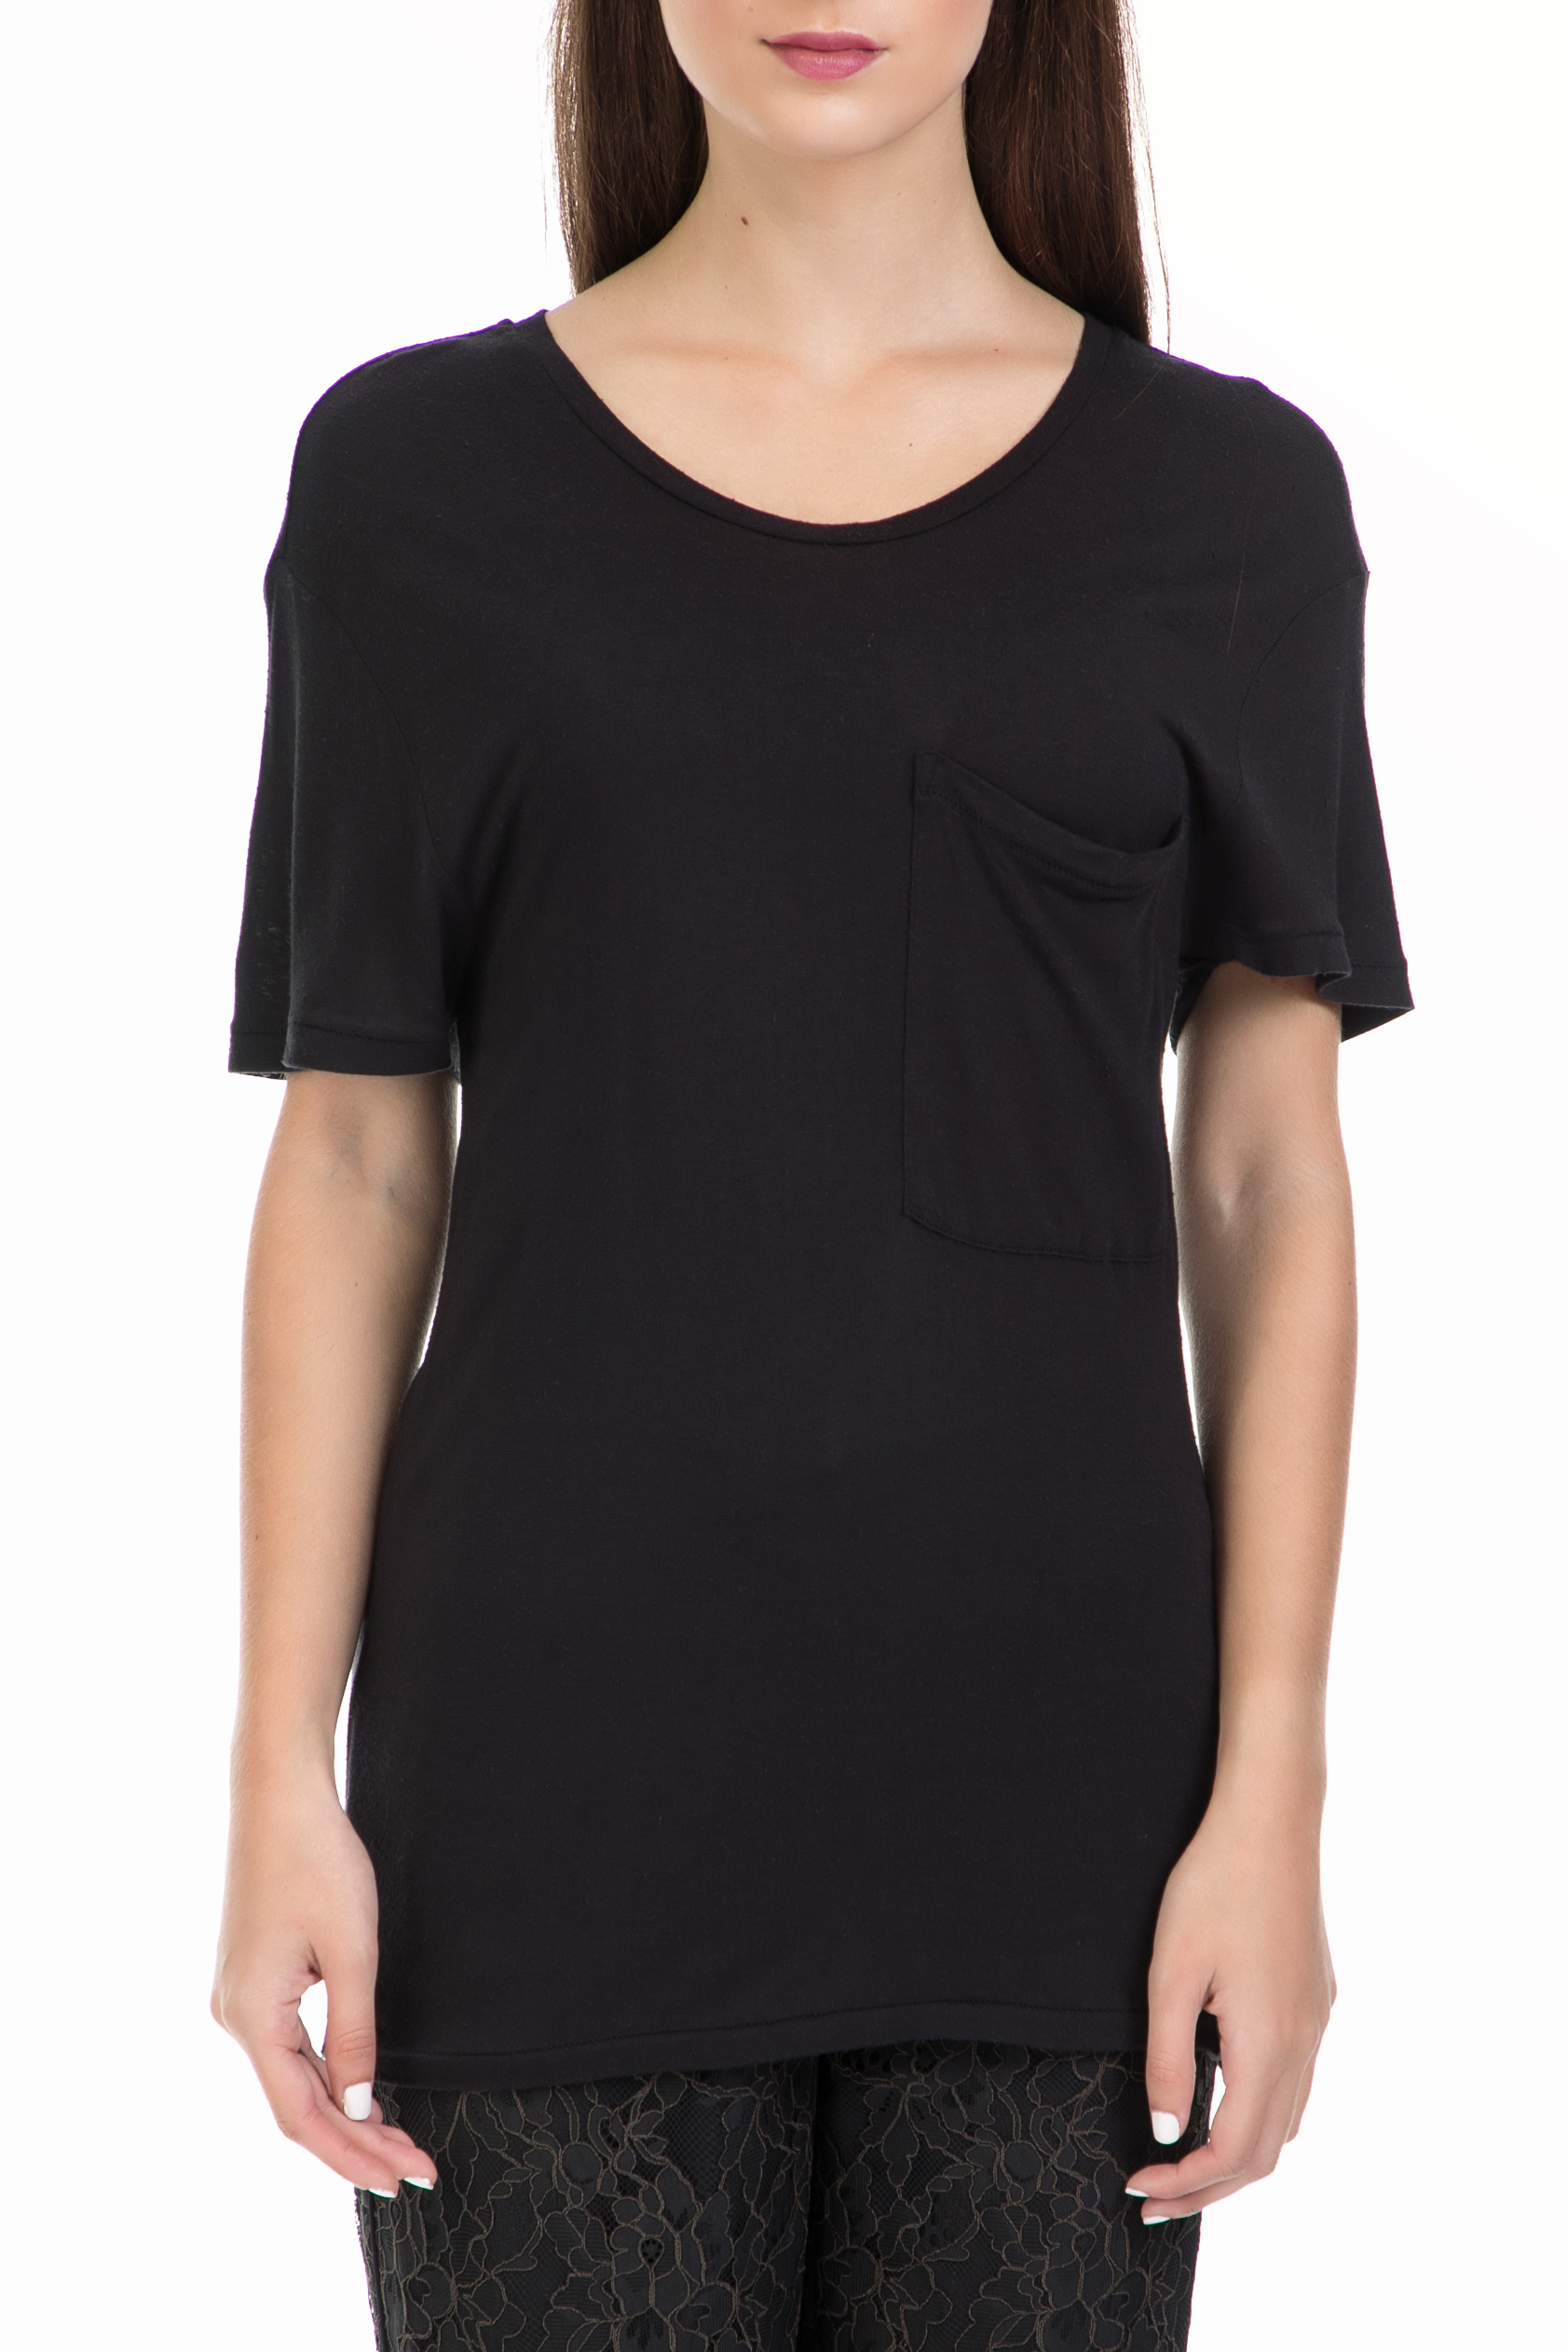 SCOTCH & SODA - Γυναικεία μπλούζα Home alone loose fitted tee μαύρη γυναικεία ρούχα μπλούζες κοντομάνικες